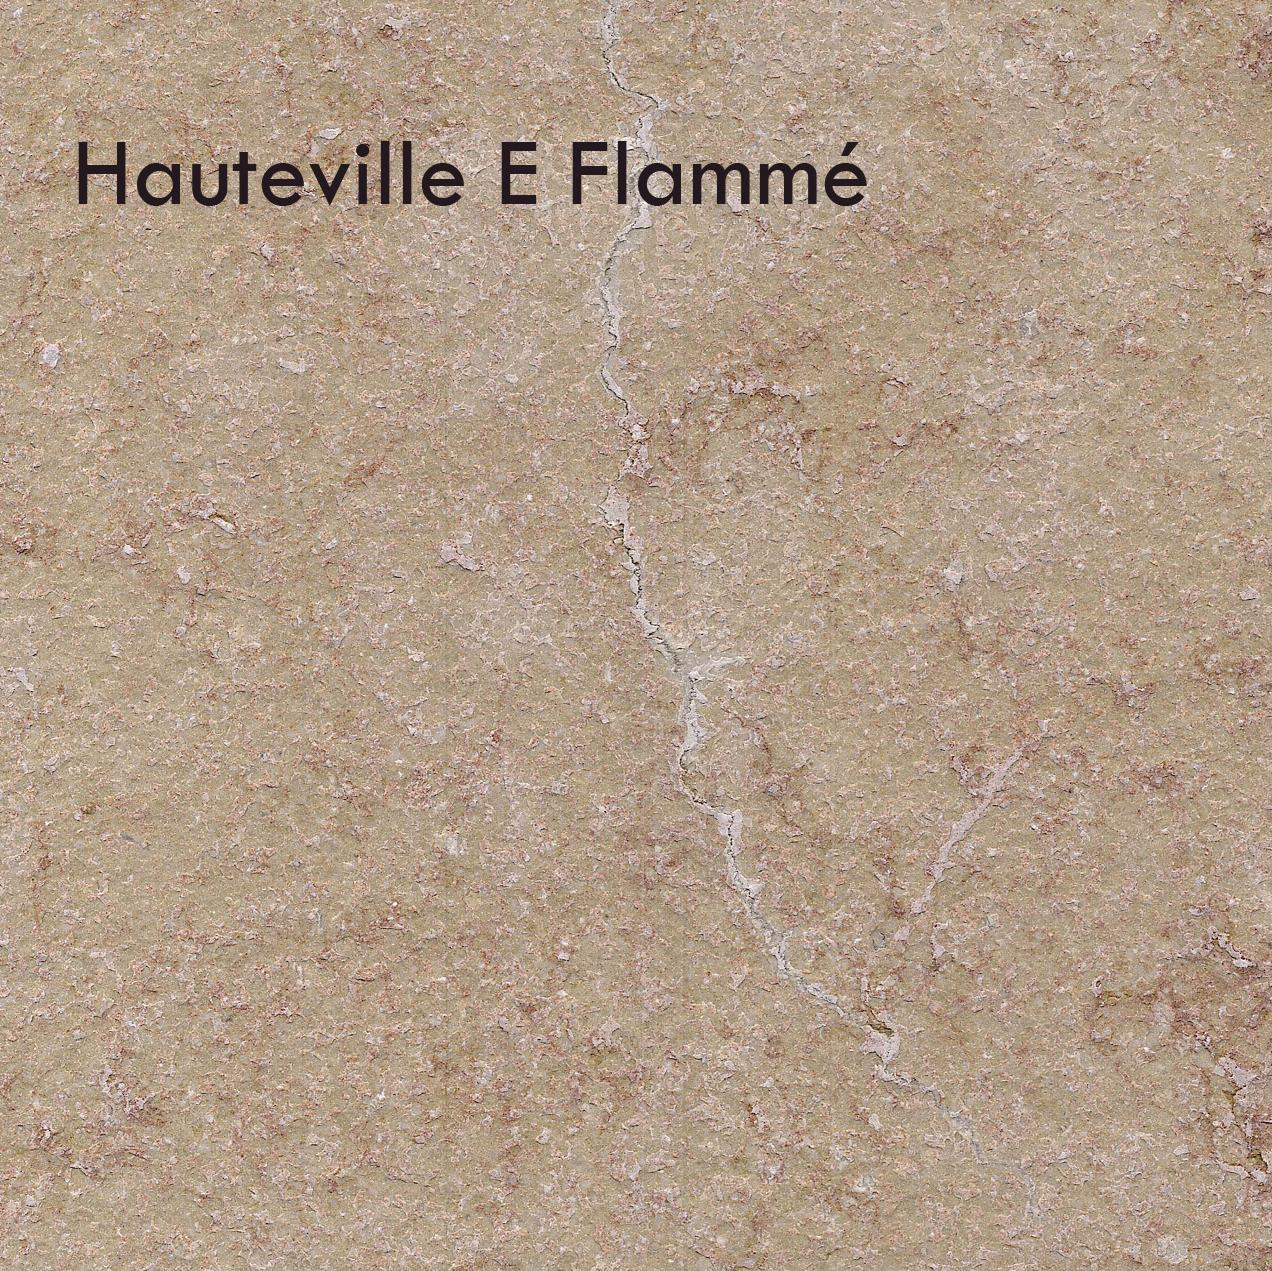 Hauteville E flammé